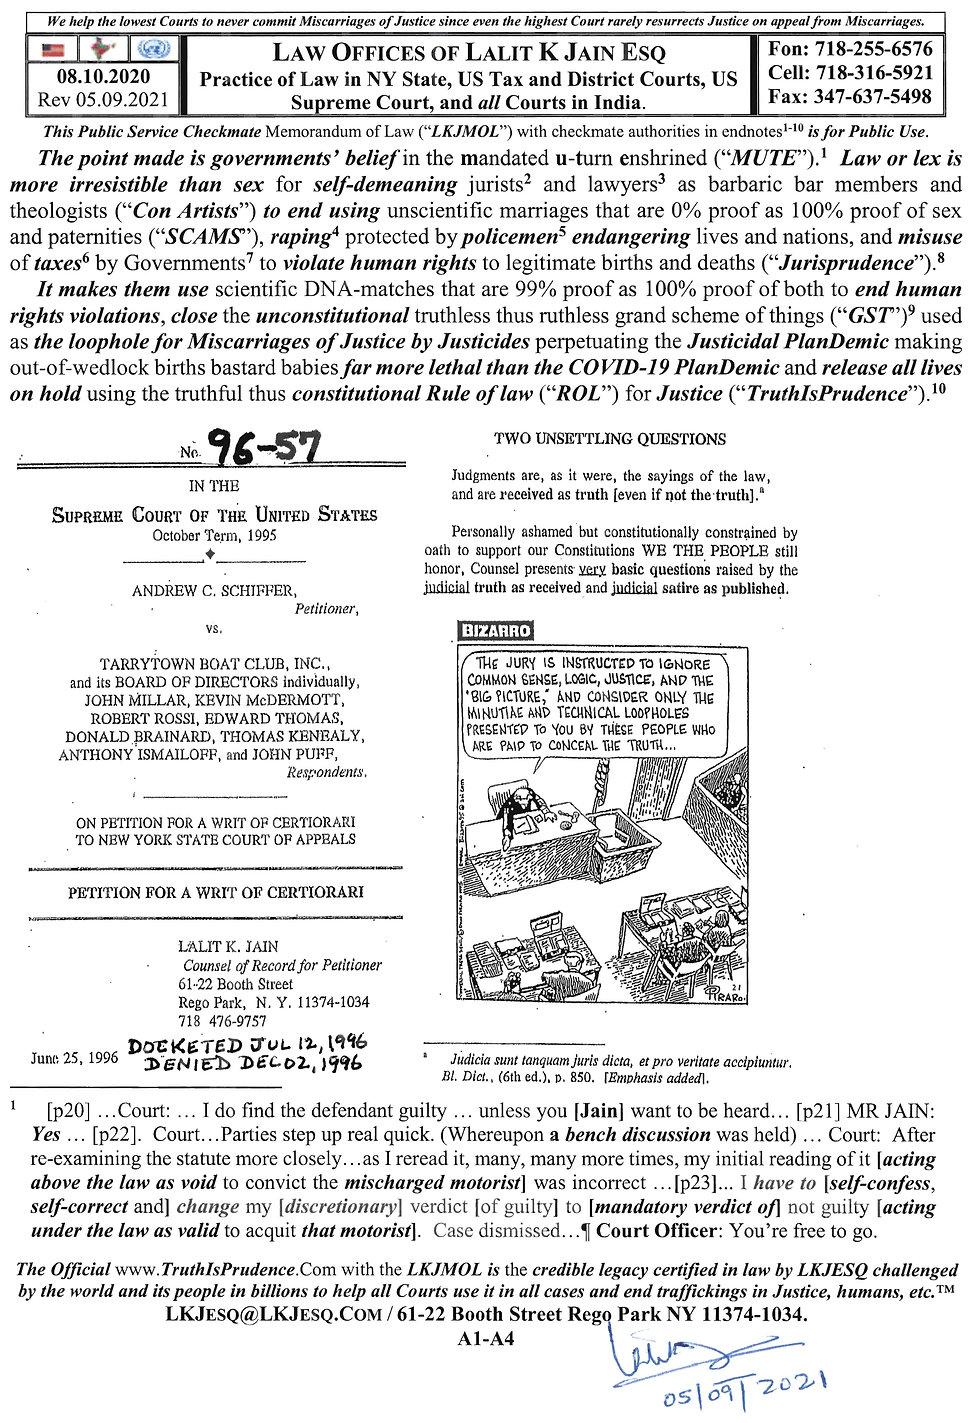 truthisprudence, www.truthisprudence.com, Lalit K. Jain Esq., Justicide, Law Offices of Lalit K Jain Esq., 718-255-6576, LKJESQ@lkjesq.com, lkjesq@gmail.com, www.truthisprudence.com, TruthIsPrudence, JurIsPrudence, Lex, Sex, Lie, Perjury, Kmindopath, Psychopath, Psychology, Kmindology, Lawyer, Liar, Predator, President, Trump, Obama, Clinton, Justice, Injustice, Justicide, Peoplitis, Googlitis, KEKSI, Stop the Oppressive Prejudice, Rape, Rapist, Predator, Pedophile, KuttingEdge KommonSense Inc., Porn, Eliot Bernstein, Epstein, Derschowitz, Polanski, Weinstein, Cosby, Clinton, Trump, Modi, iviewit, www.iviewit.tv, Briana Martins, Marla Martins, Martins v. Royal Caribbean, Florida Judge Jonathan Goodman, due process of law, www.courtapprovedmurderontheseas.com, Court Approved Murder On The Seas, Judge Dina A. Keever-Agrama, Judge Martin Colin, Judge Kasternakes, Judicial Corruption, Court Corruption, Pro Se, Covid 19, Coronavirus, HIV, AIDS, PIV +, PIV-, Politically Induced Virus, LKJESQ